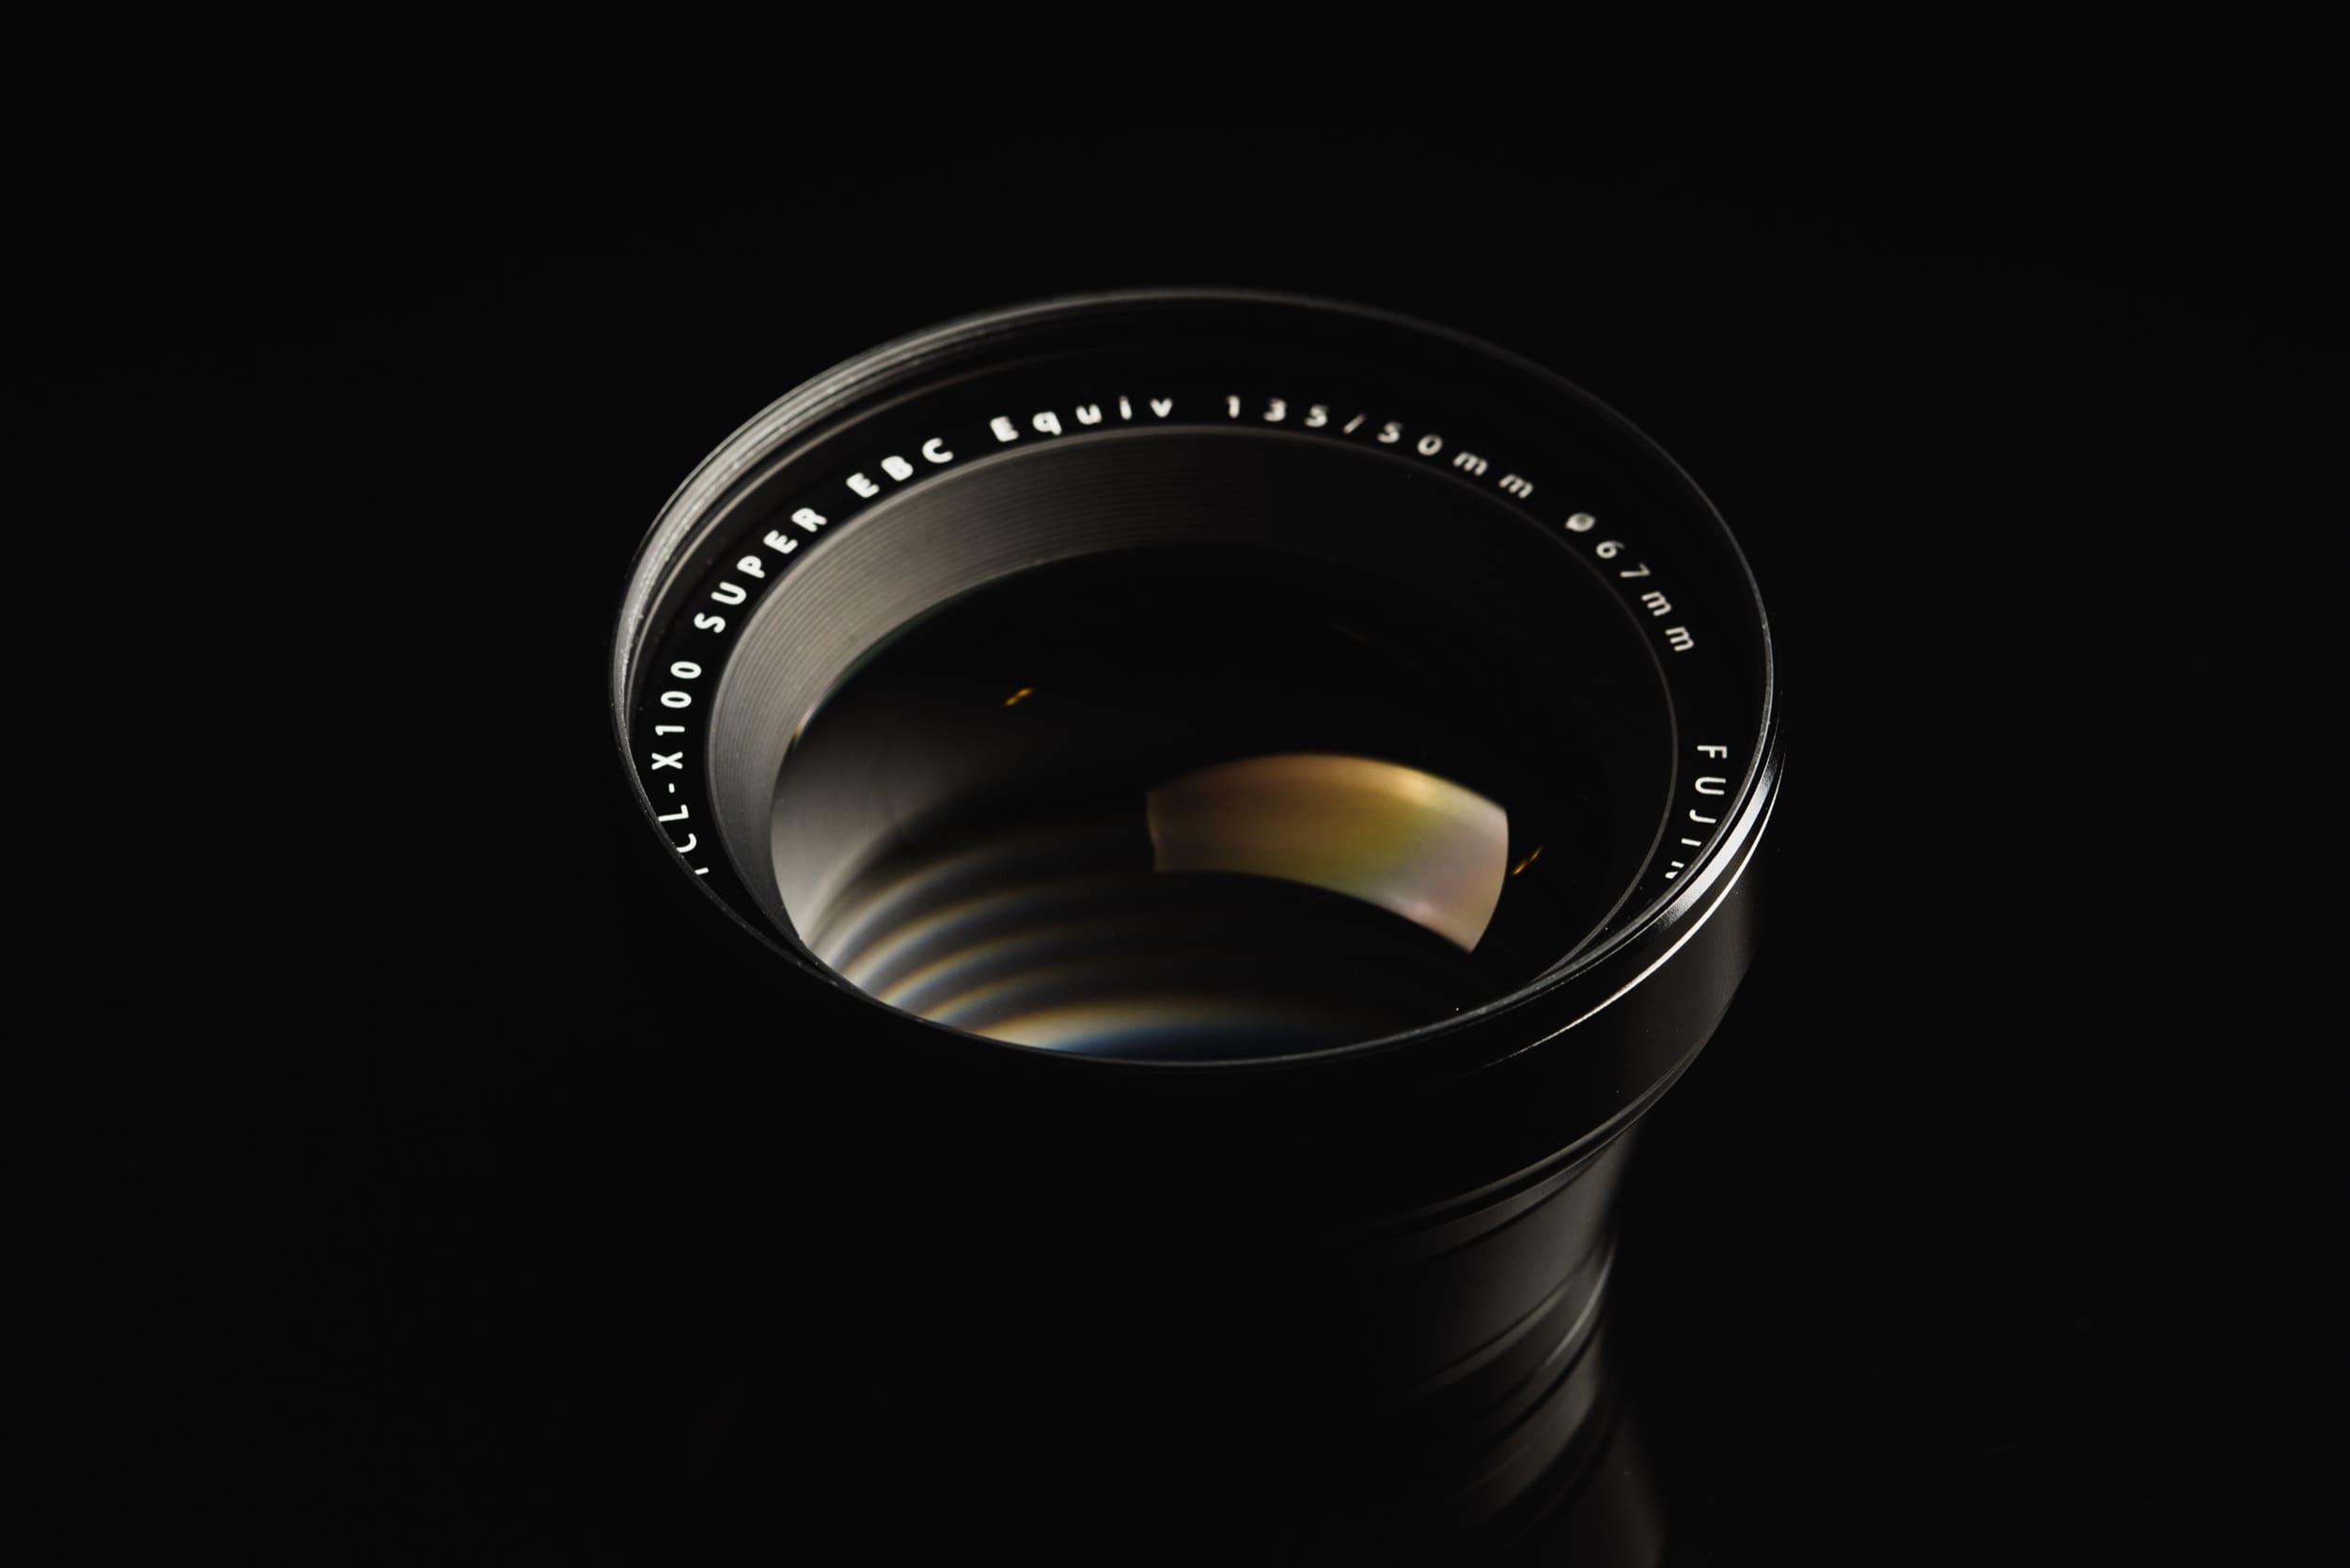 Fujifilm TCL-X100 Front View